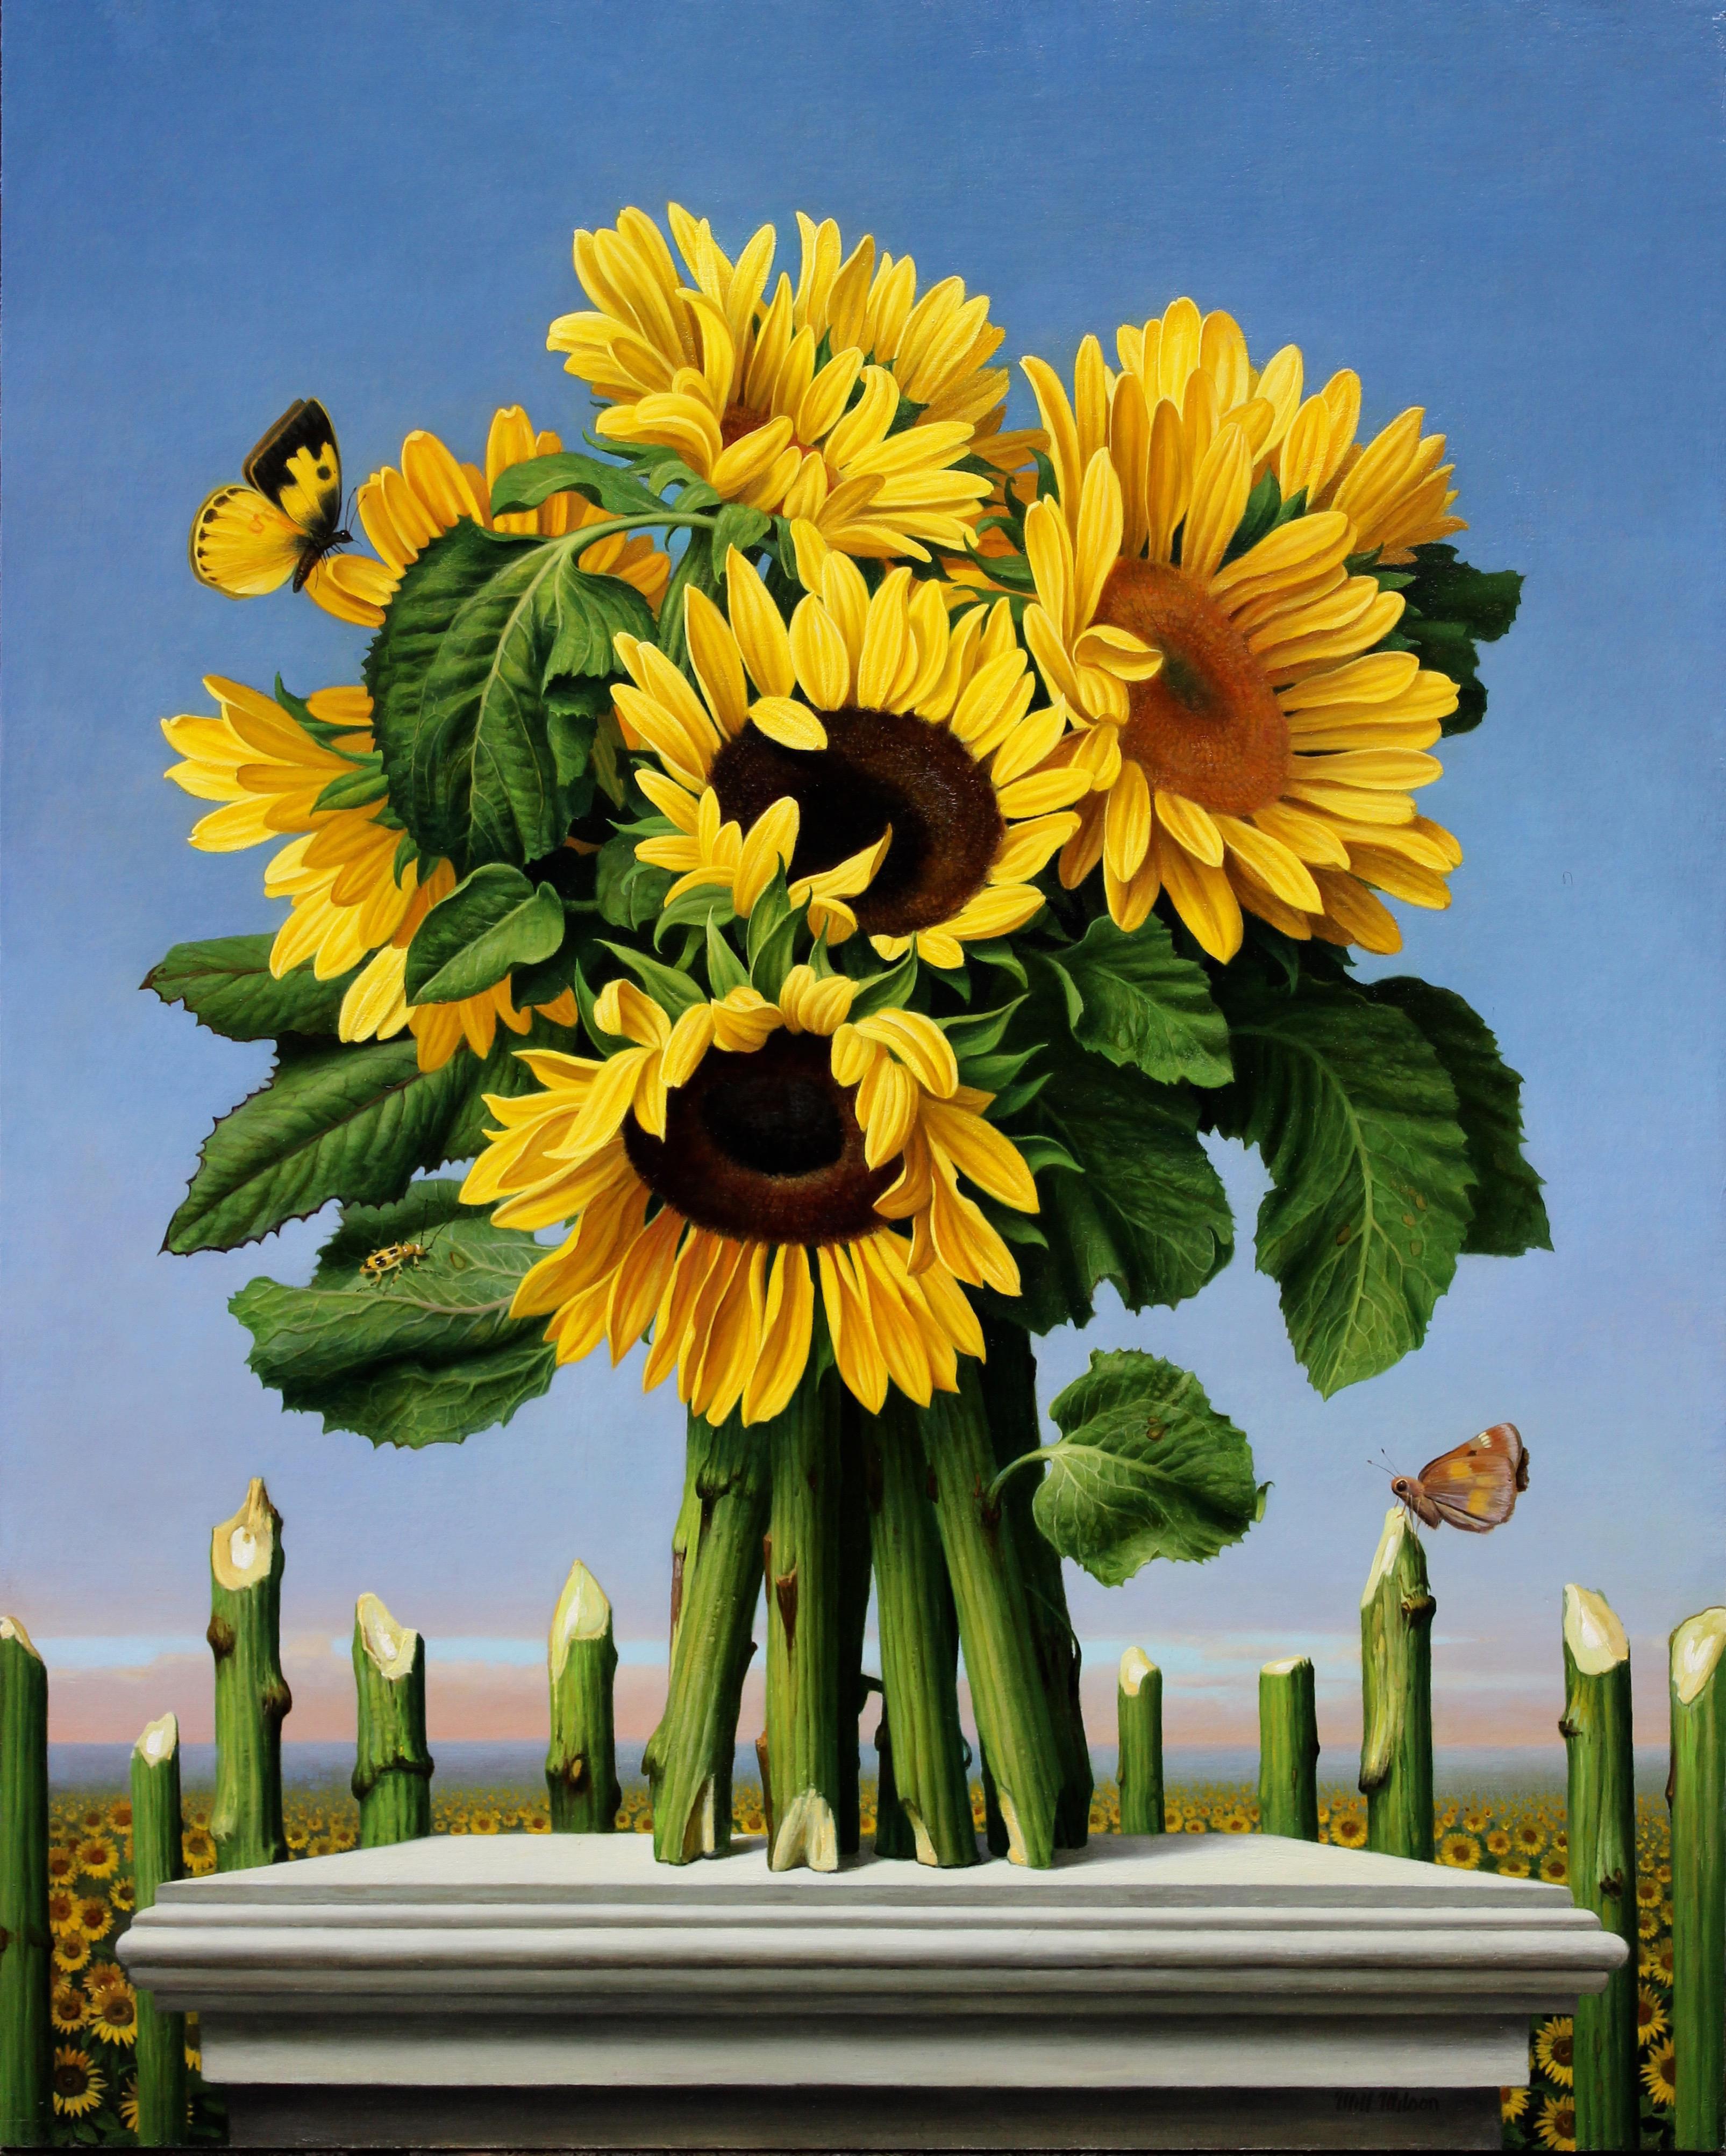 GIRASOL (vivid colors, photorealism, sunflowers, still life)